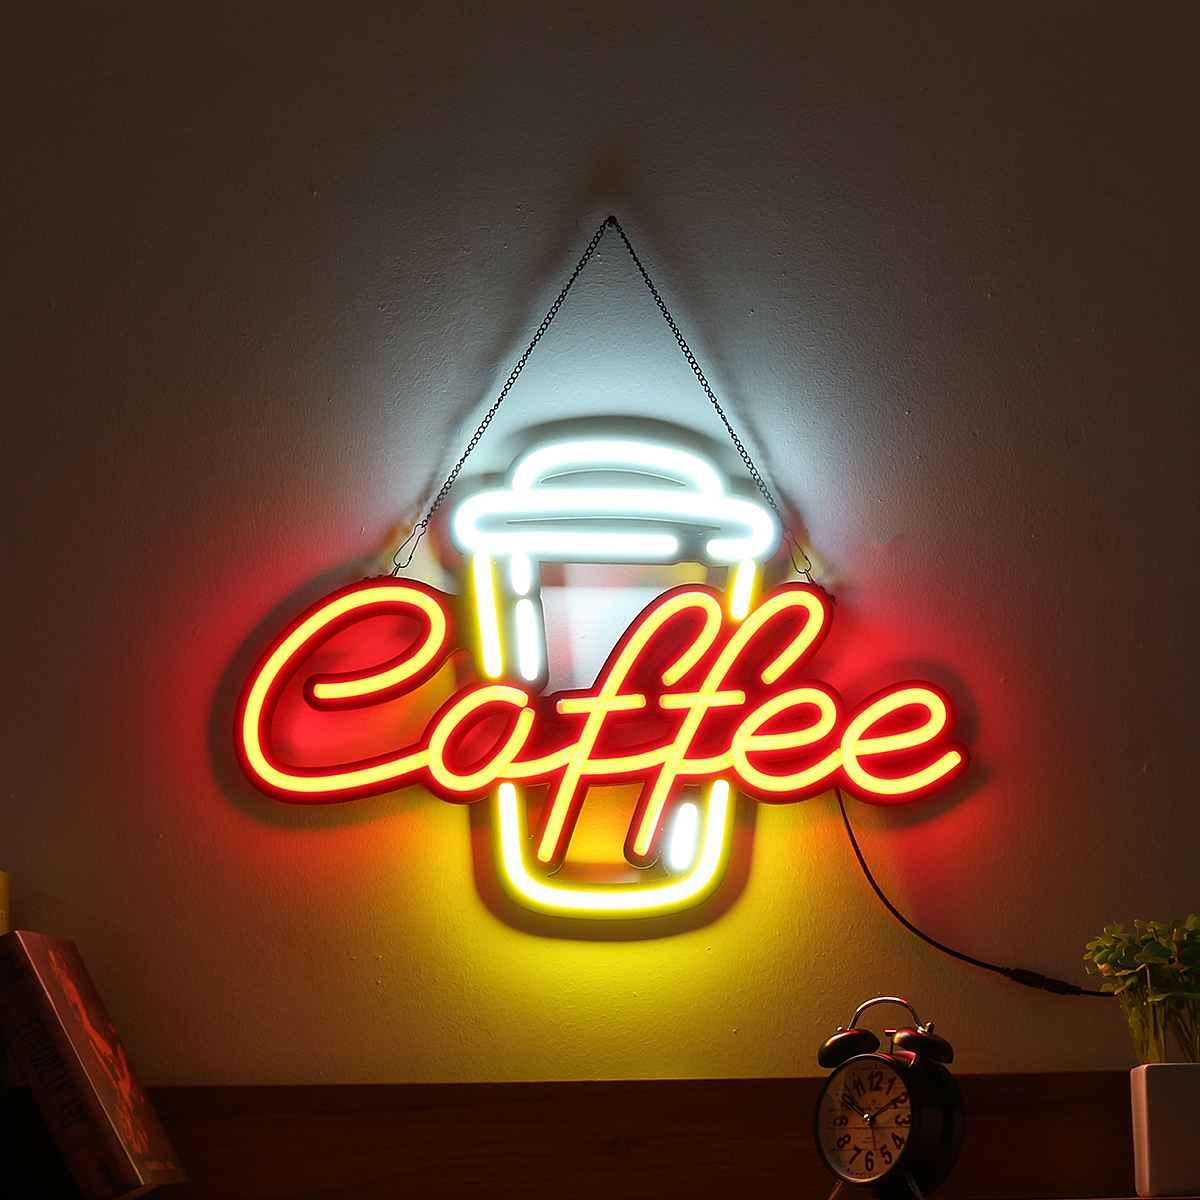 LED Neon Sign Light Tube Visual Artwork Coffee Bar Club KTV Wall Decoration Commercial Lighting Fixture Neon Bulbs Cafeteria|Neon Bulbs & Tubes| |  - title=